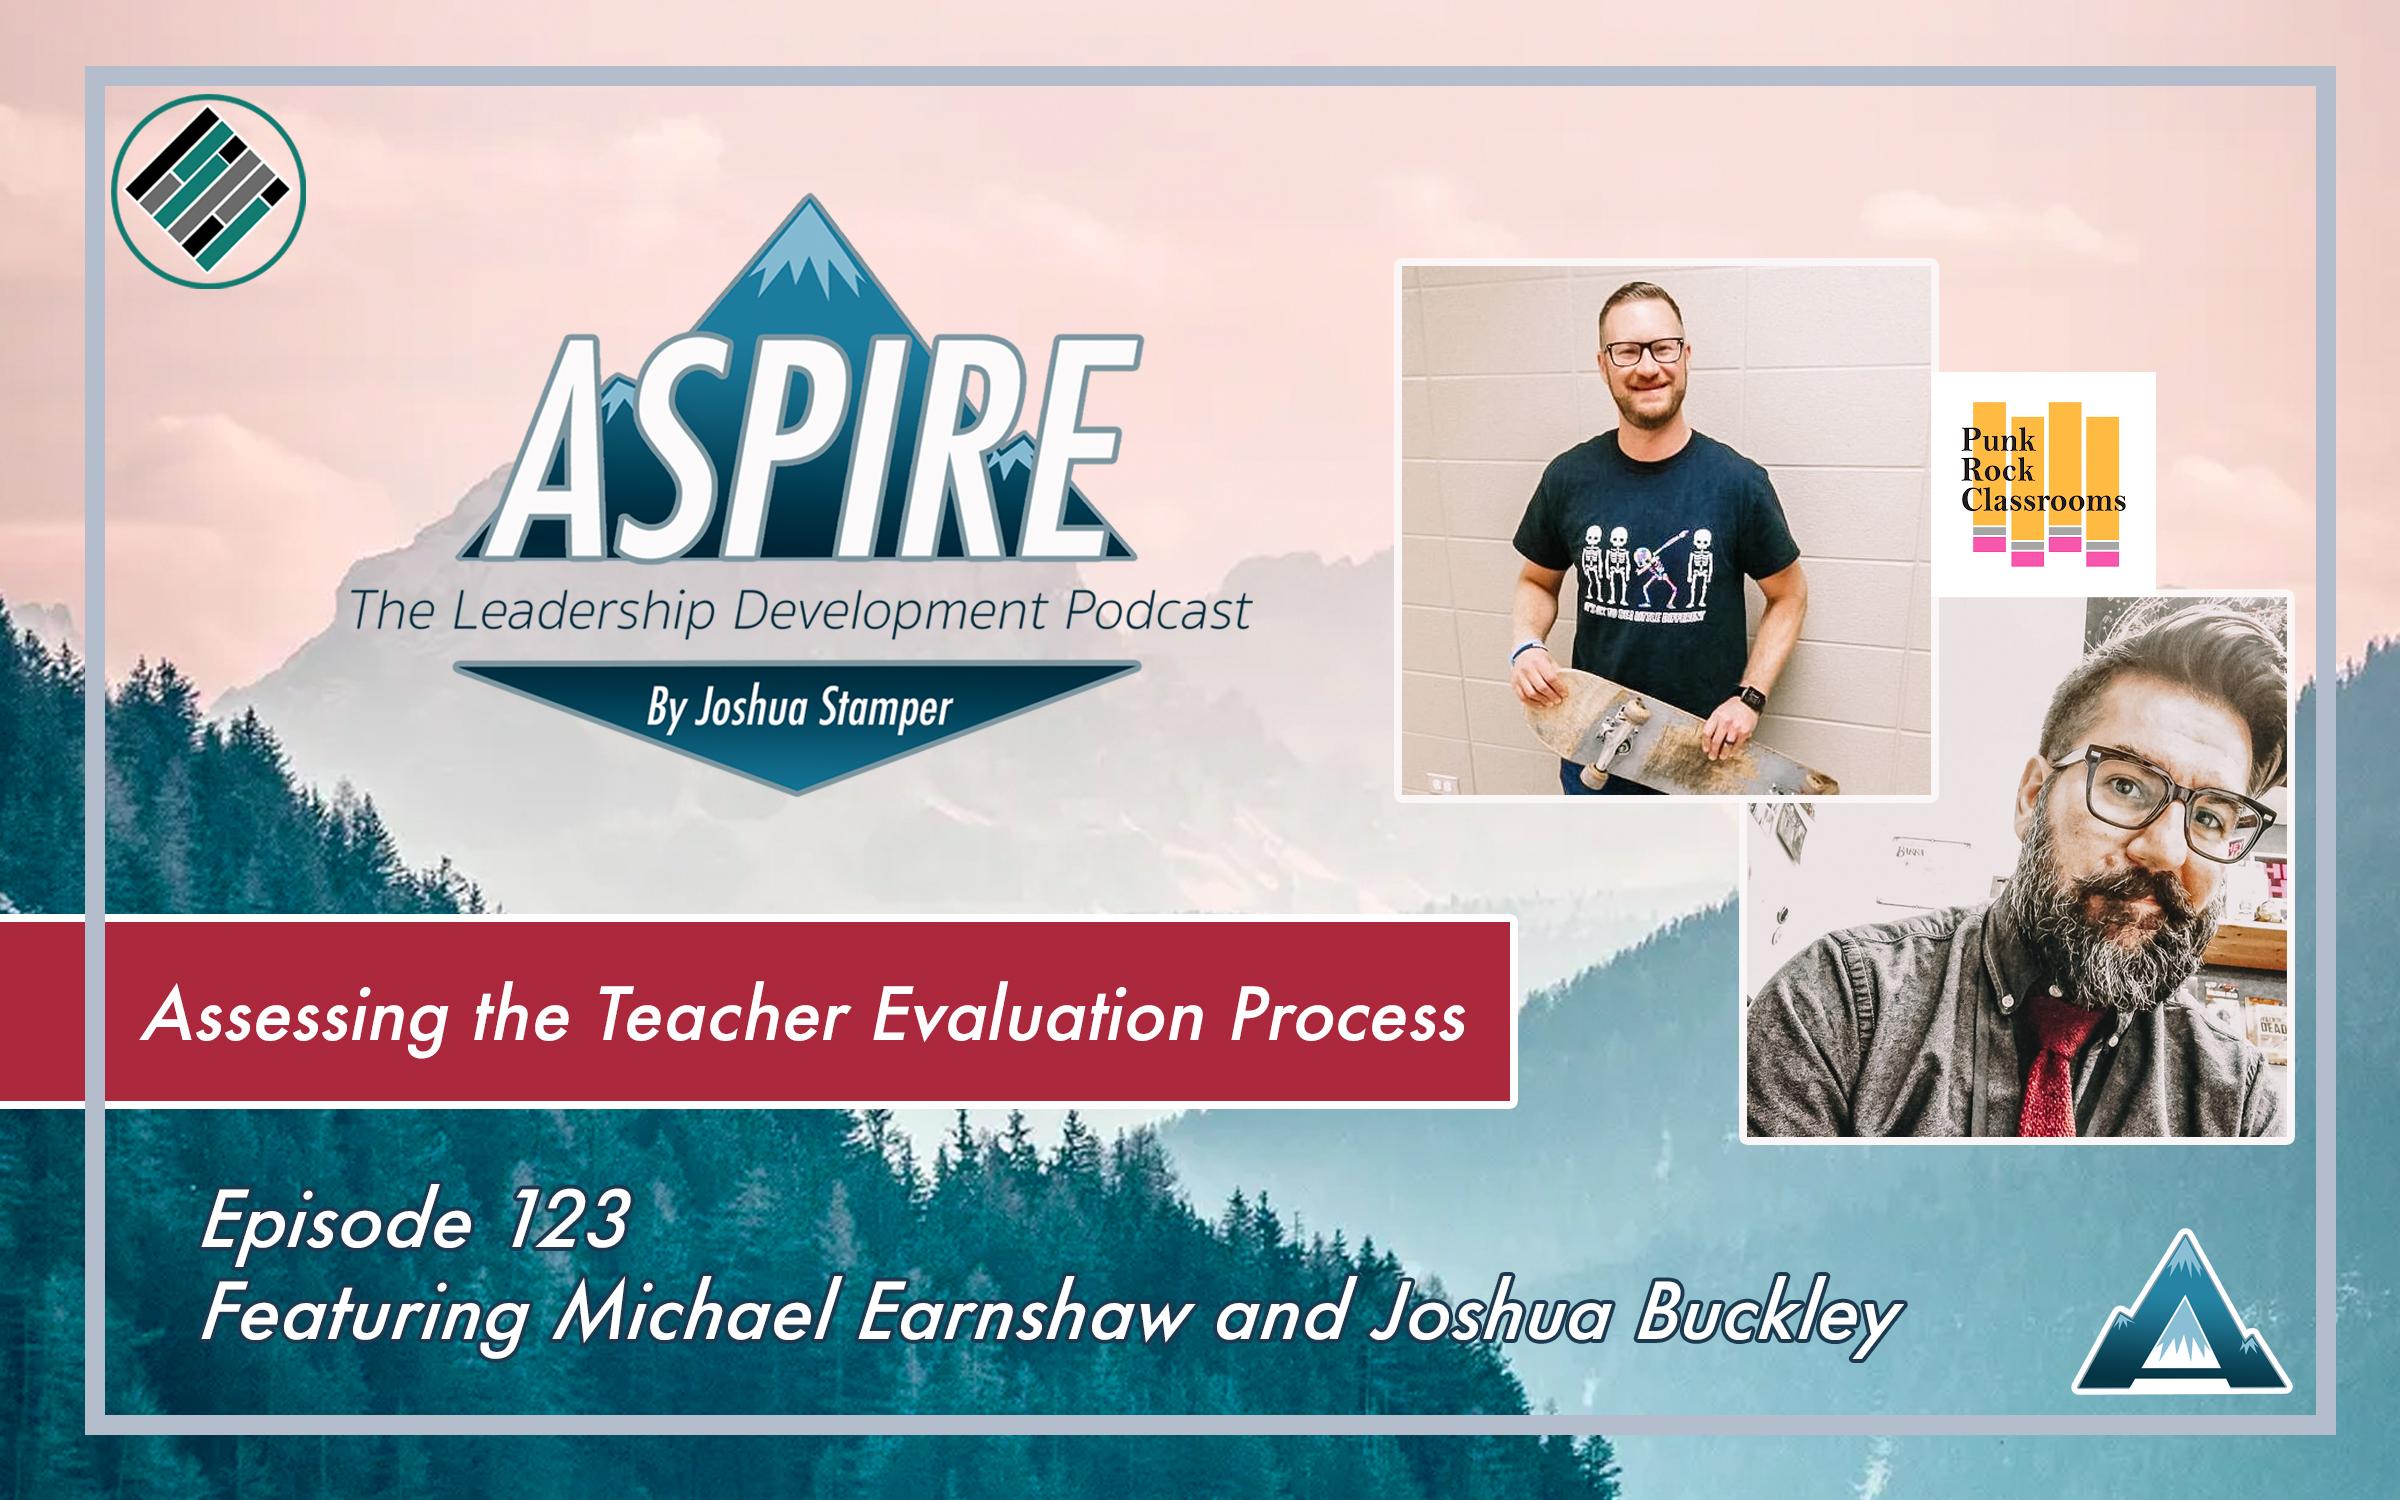 Michael Earnshaw, Joshua Buckley, Joshua Stamper, Aspire: The Leadership Development Podcast, Punk Rock Classroom